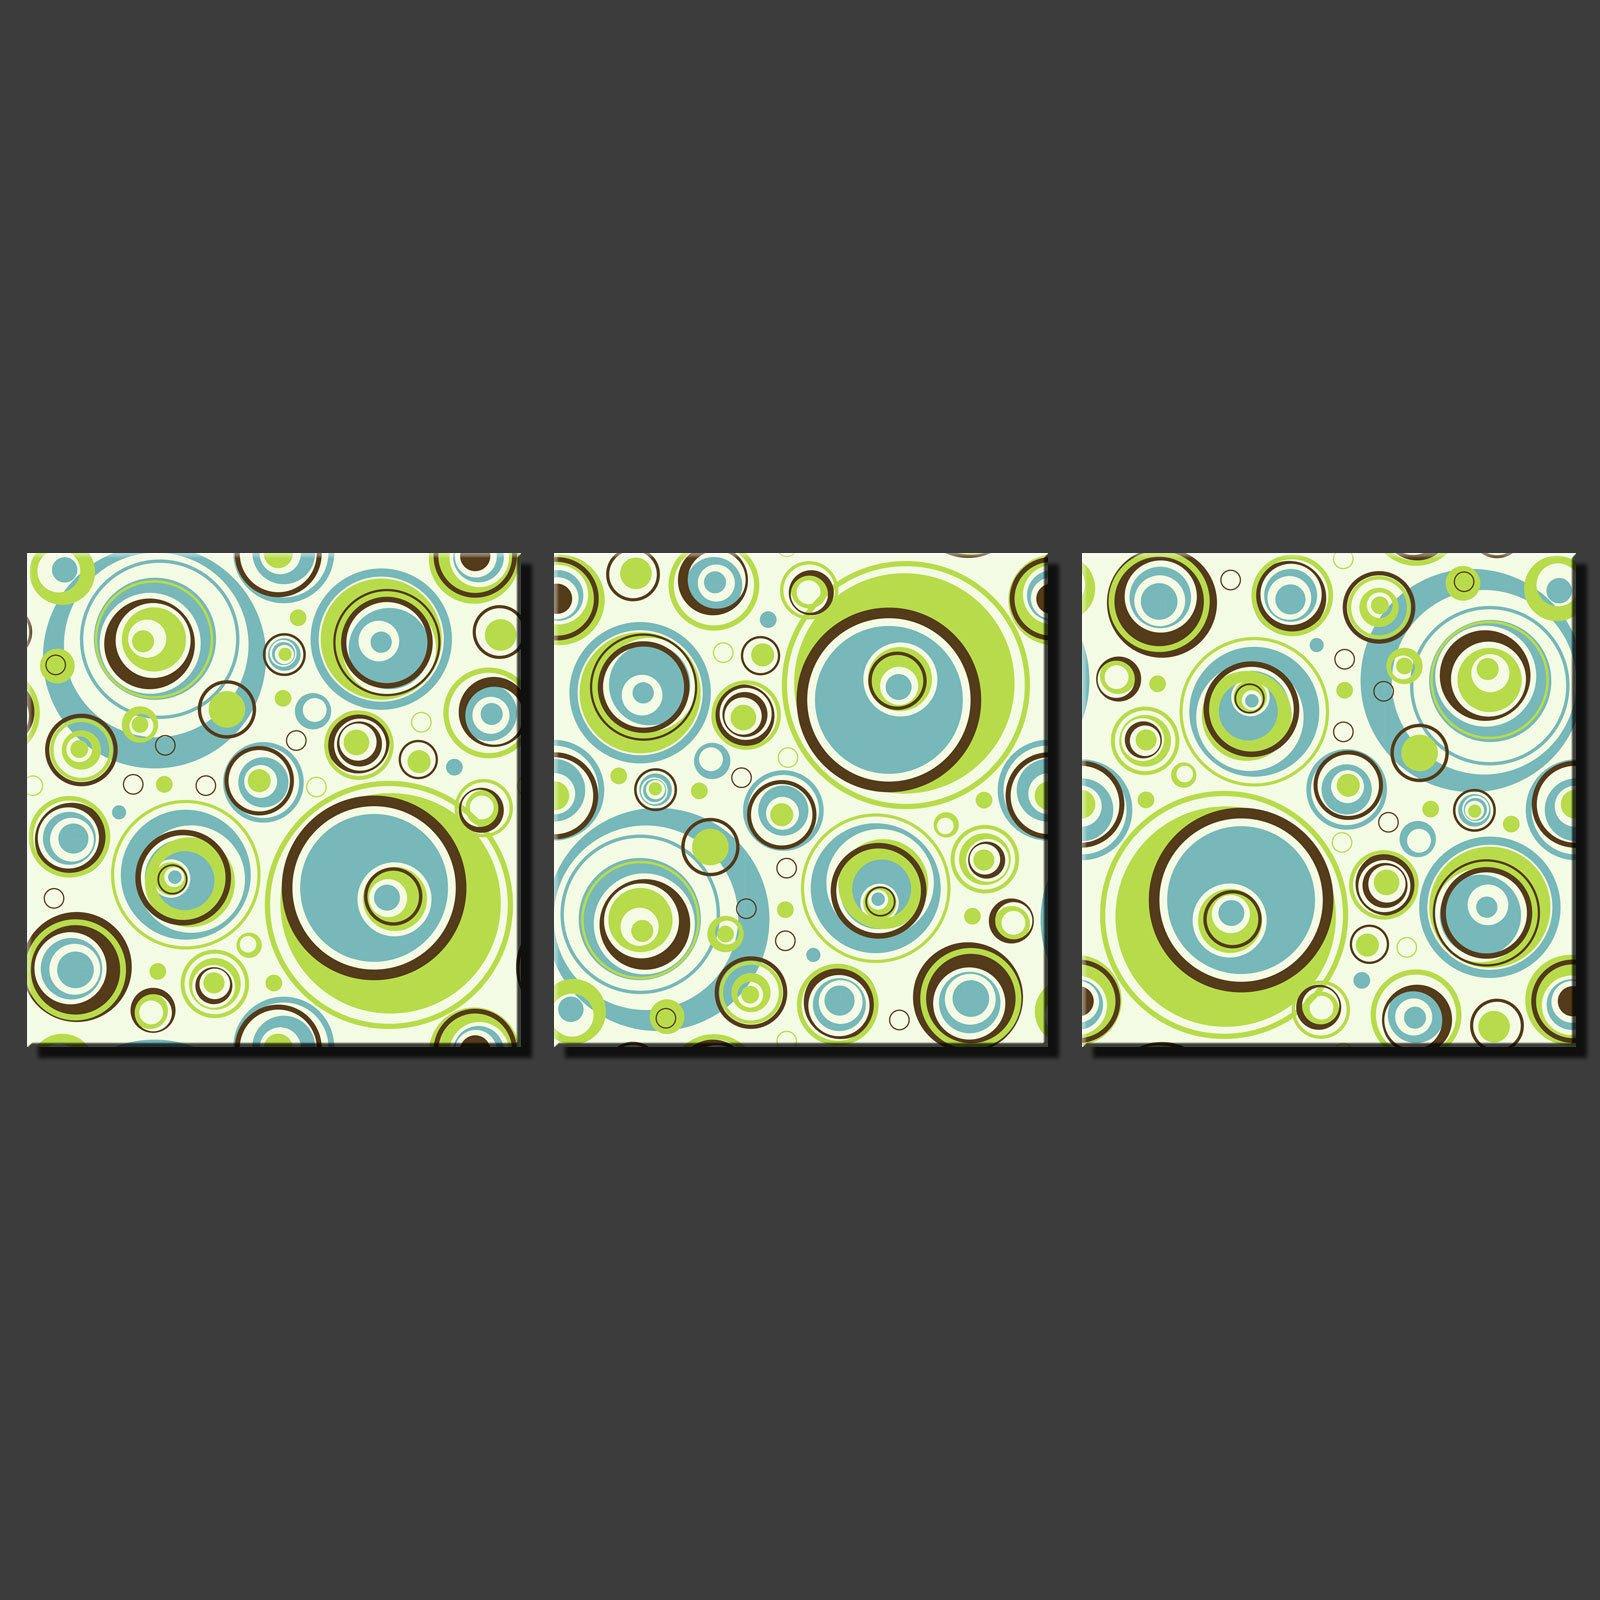 Elegant ABSTRACT CIRCLE MODERN DESIGN 3 PANELS SPLIT CANVAS WALL ART PICTURES PRINTS